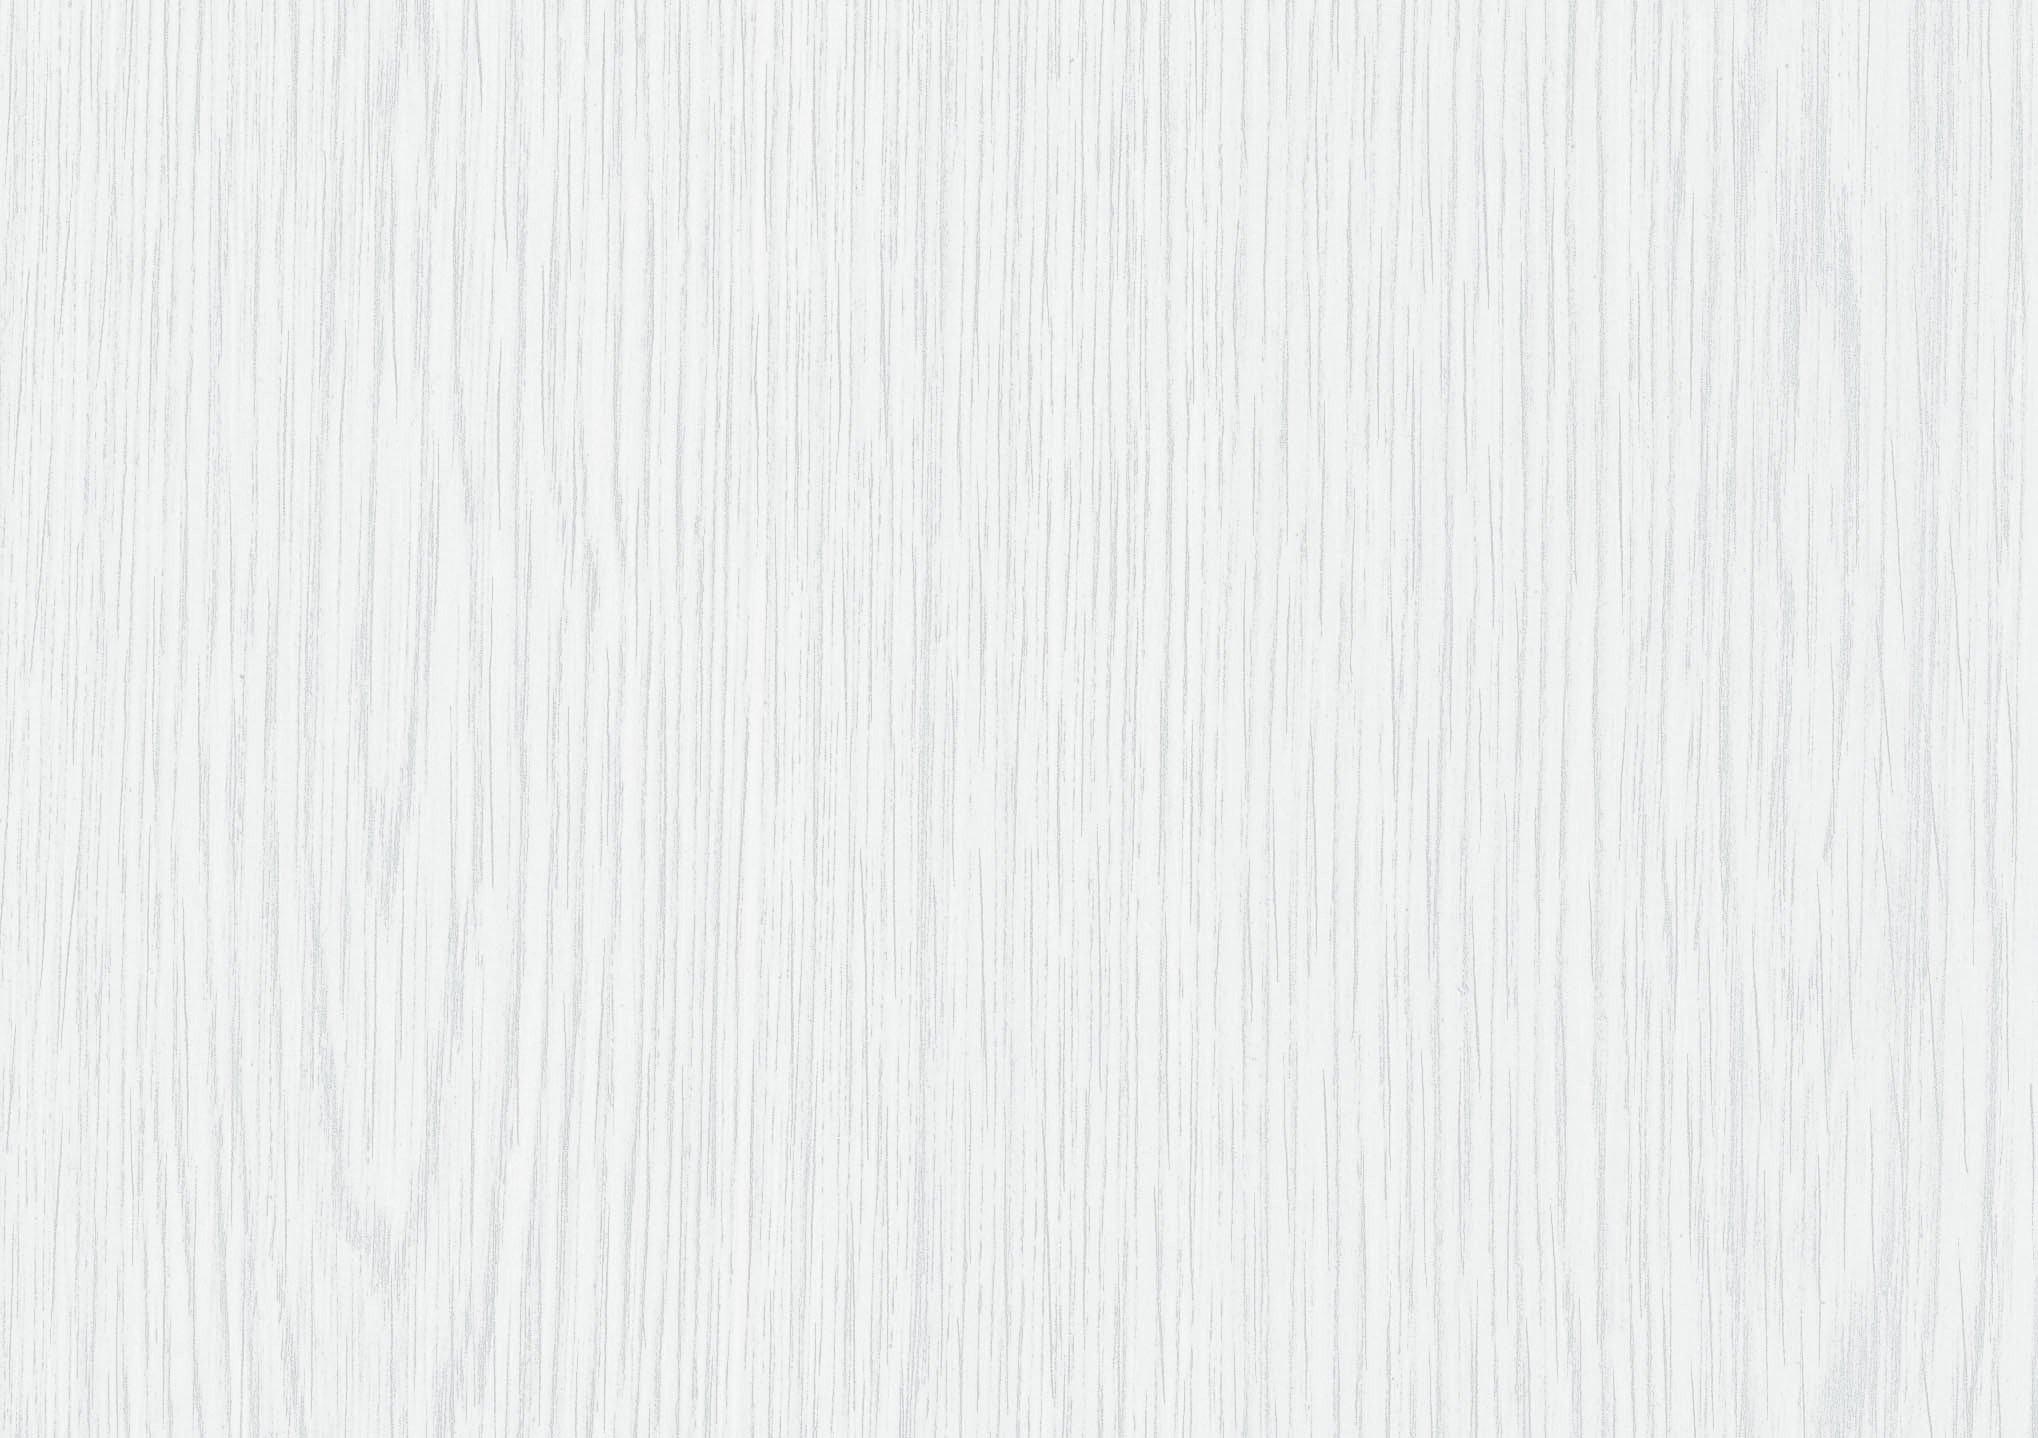 d-c-fix Self-Adhesive Film, Whitewood, 17.71'' x 78'' Roll, 346-0089